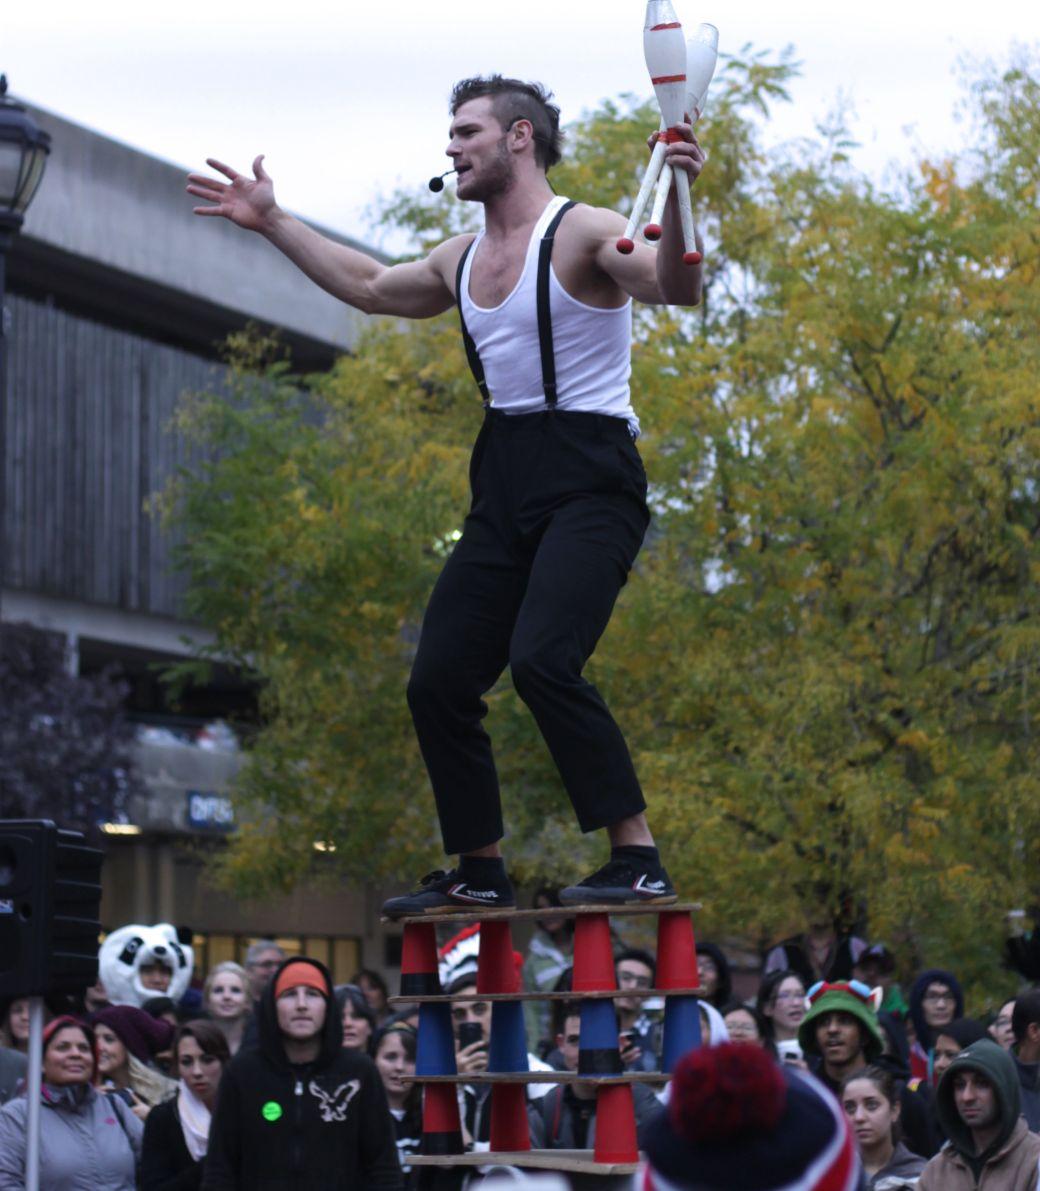 salem halloween october 31 2014 orion griffiths street performer 2